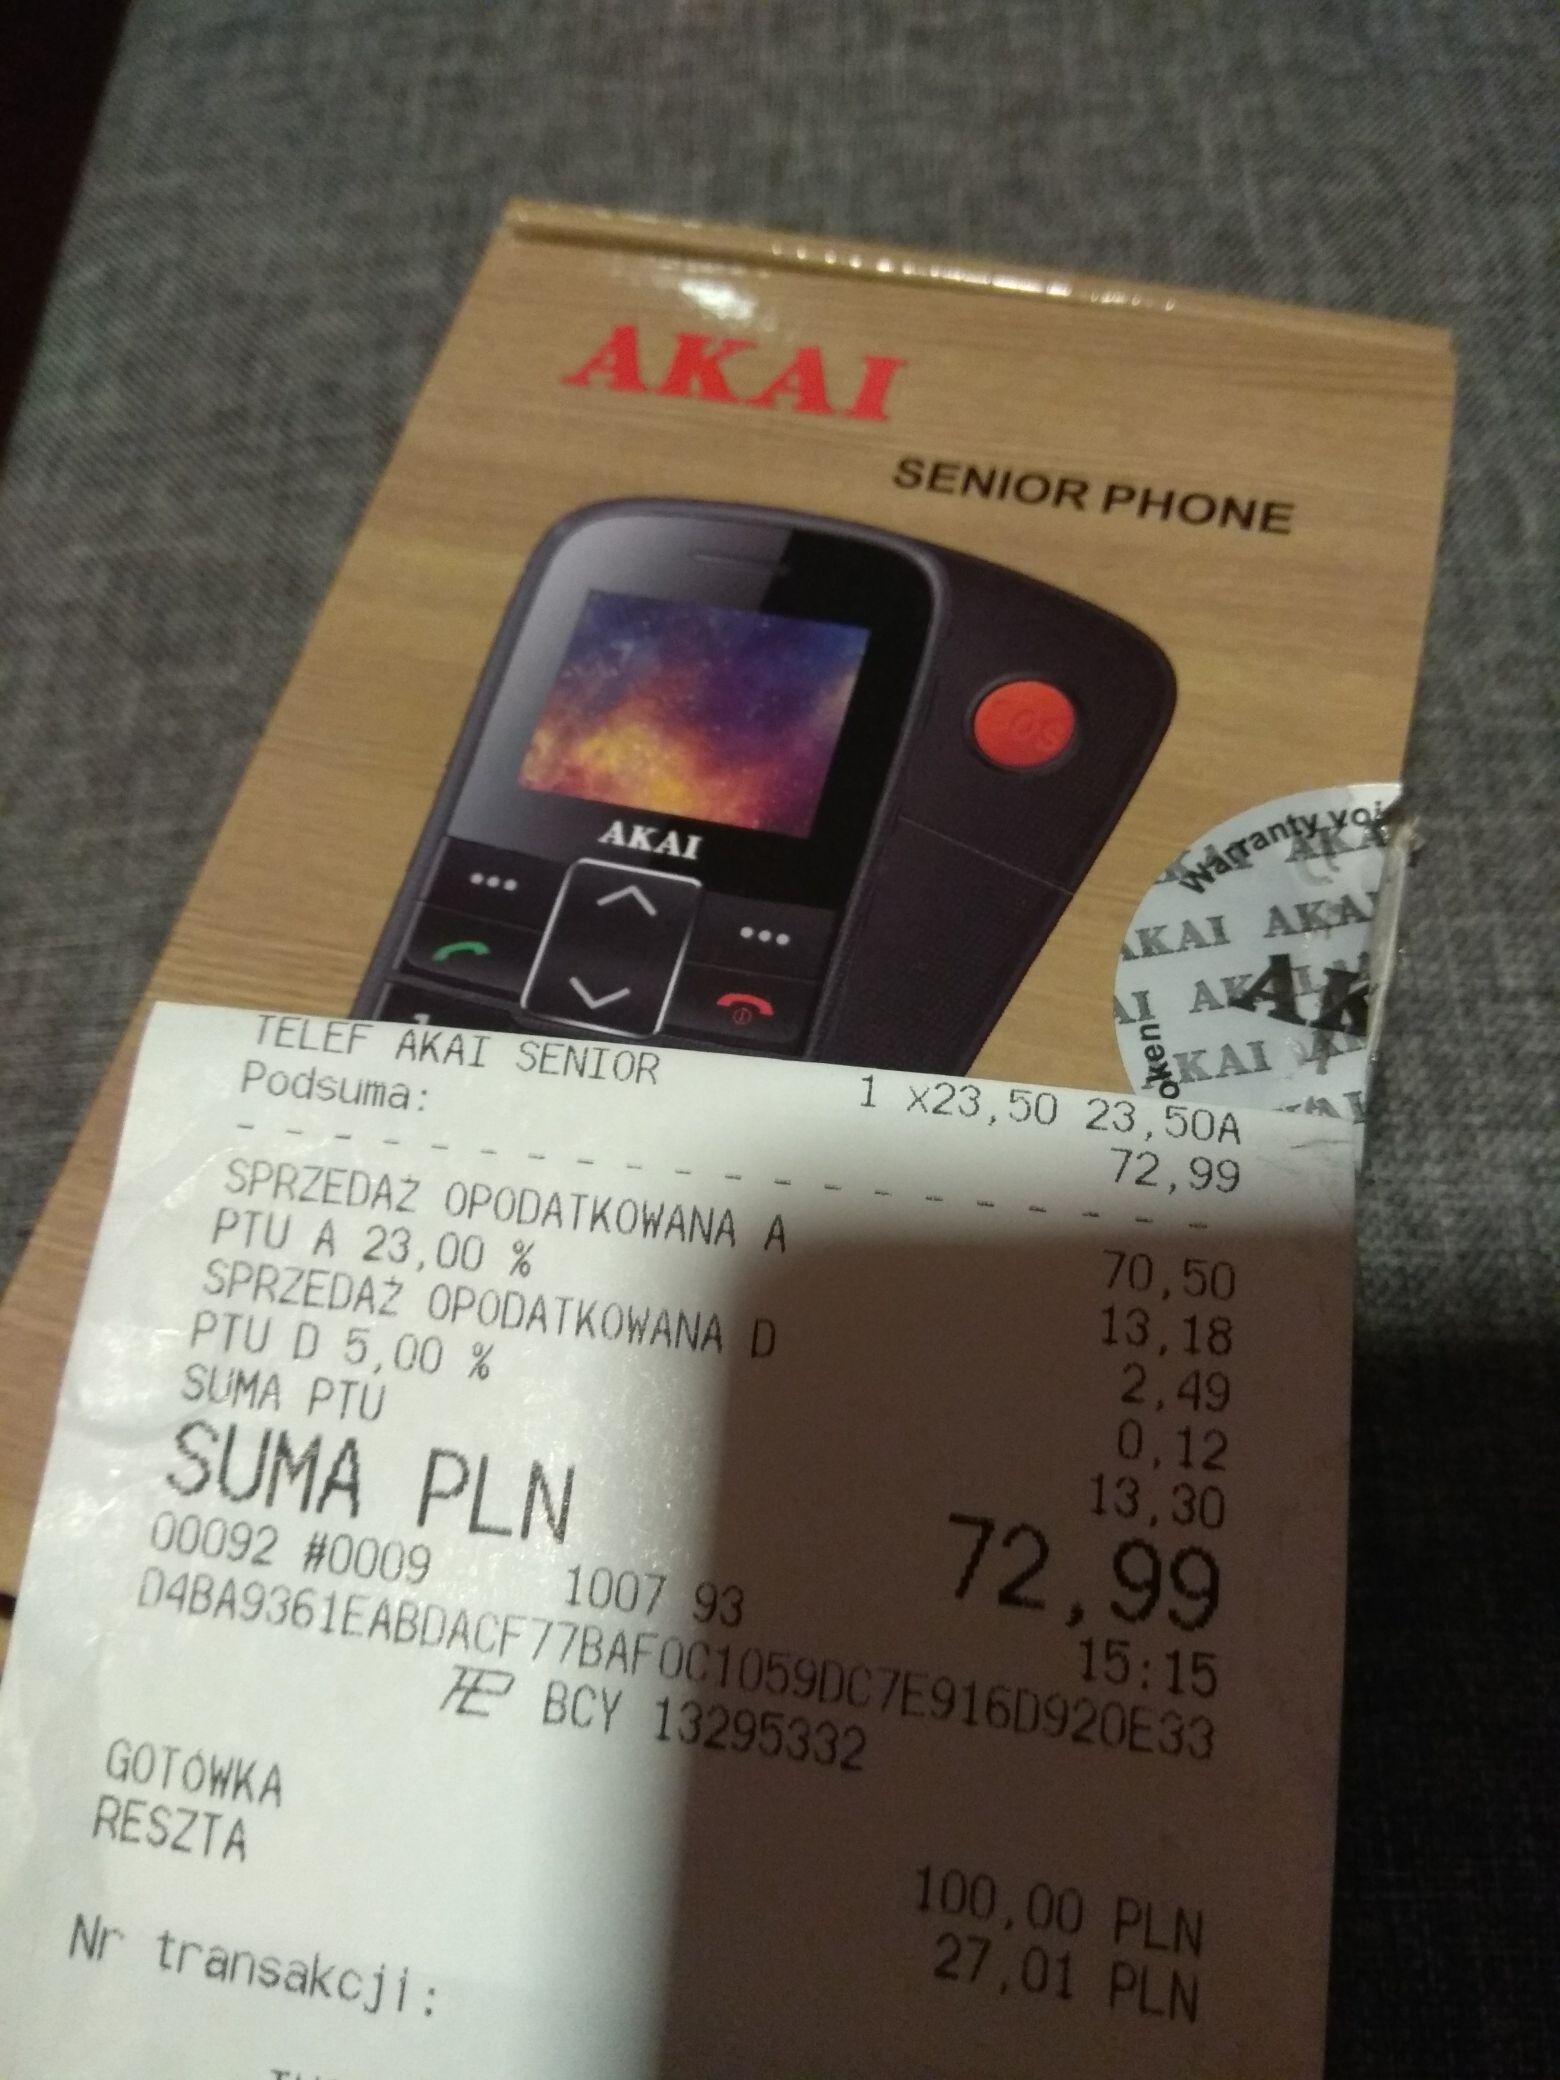 Tesco Gliwice EC Akai telefon dla seniora